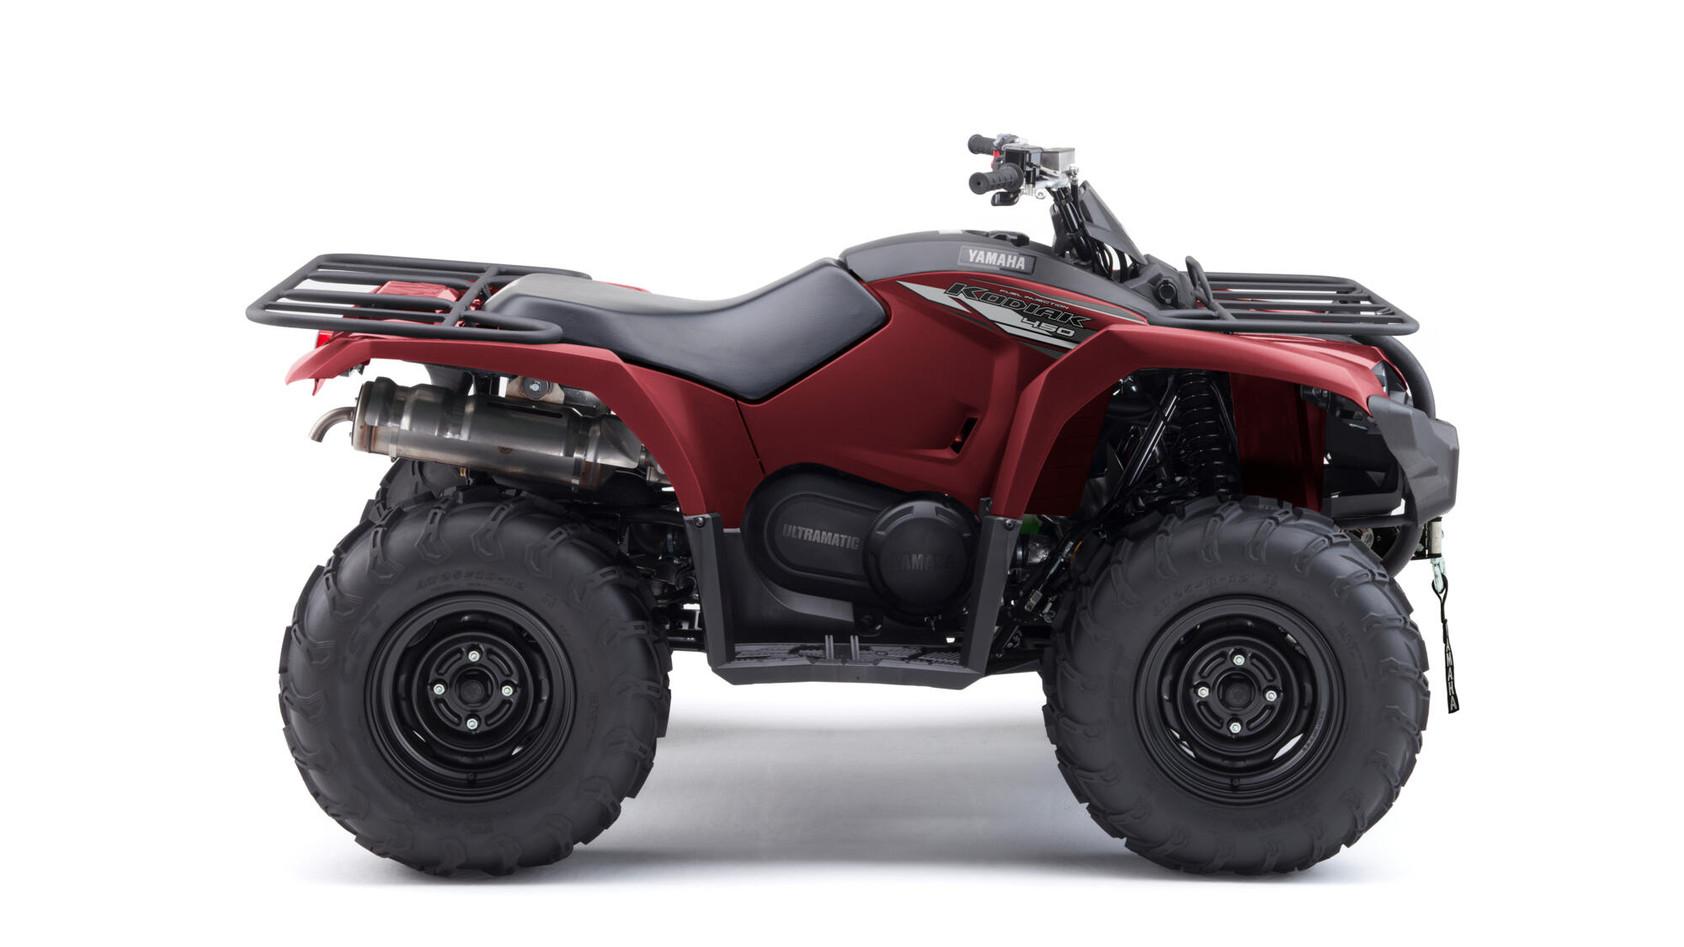 2020-Yamaha-YFM450FWBD-EU-Ridge_Red-Stat